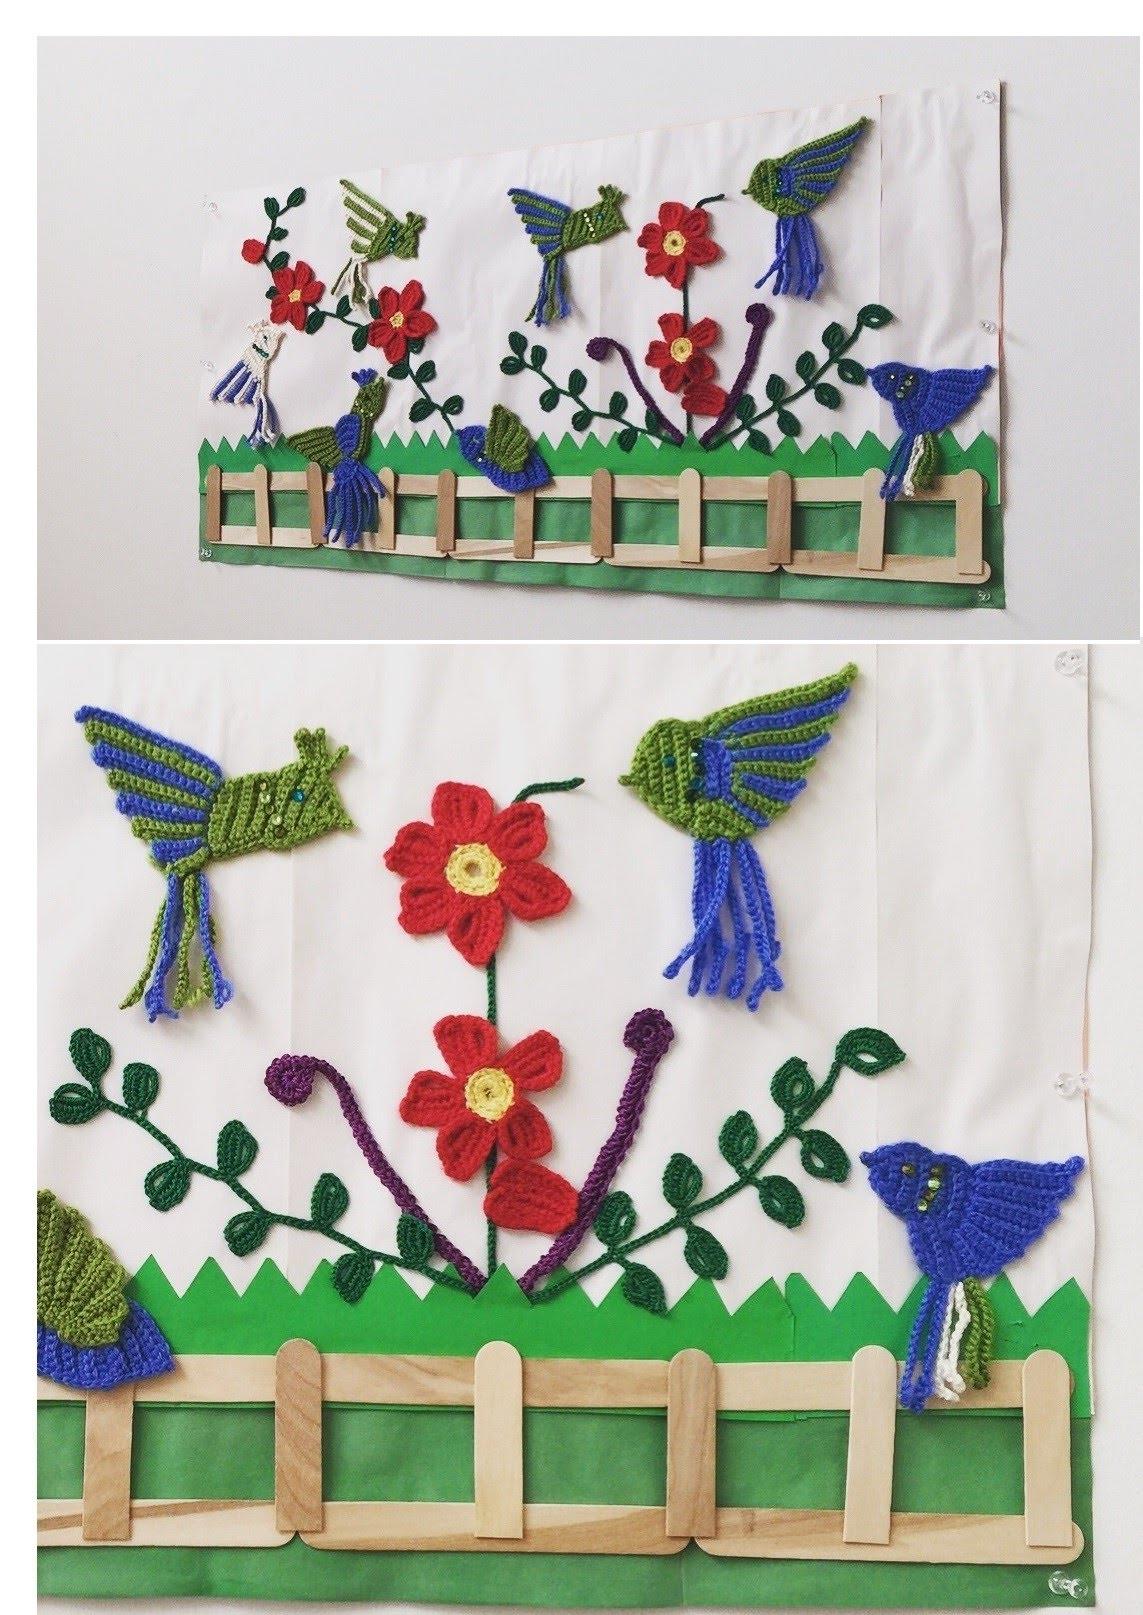 Crochet Appliques – Crochet Wall Decor – Youtube Pertaining To Latest Crochet Wall Art (View 8 of 20)